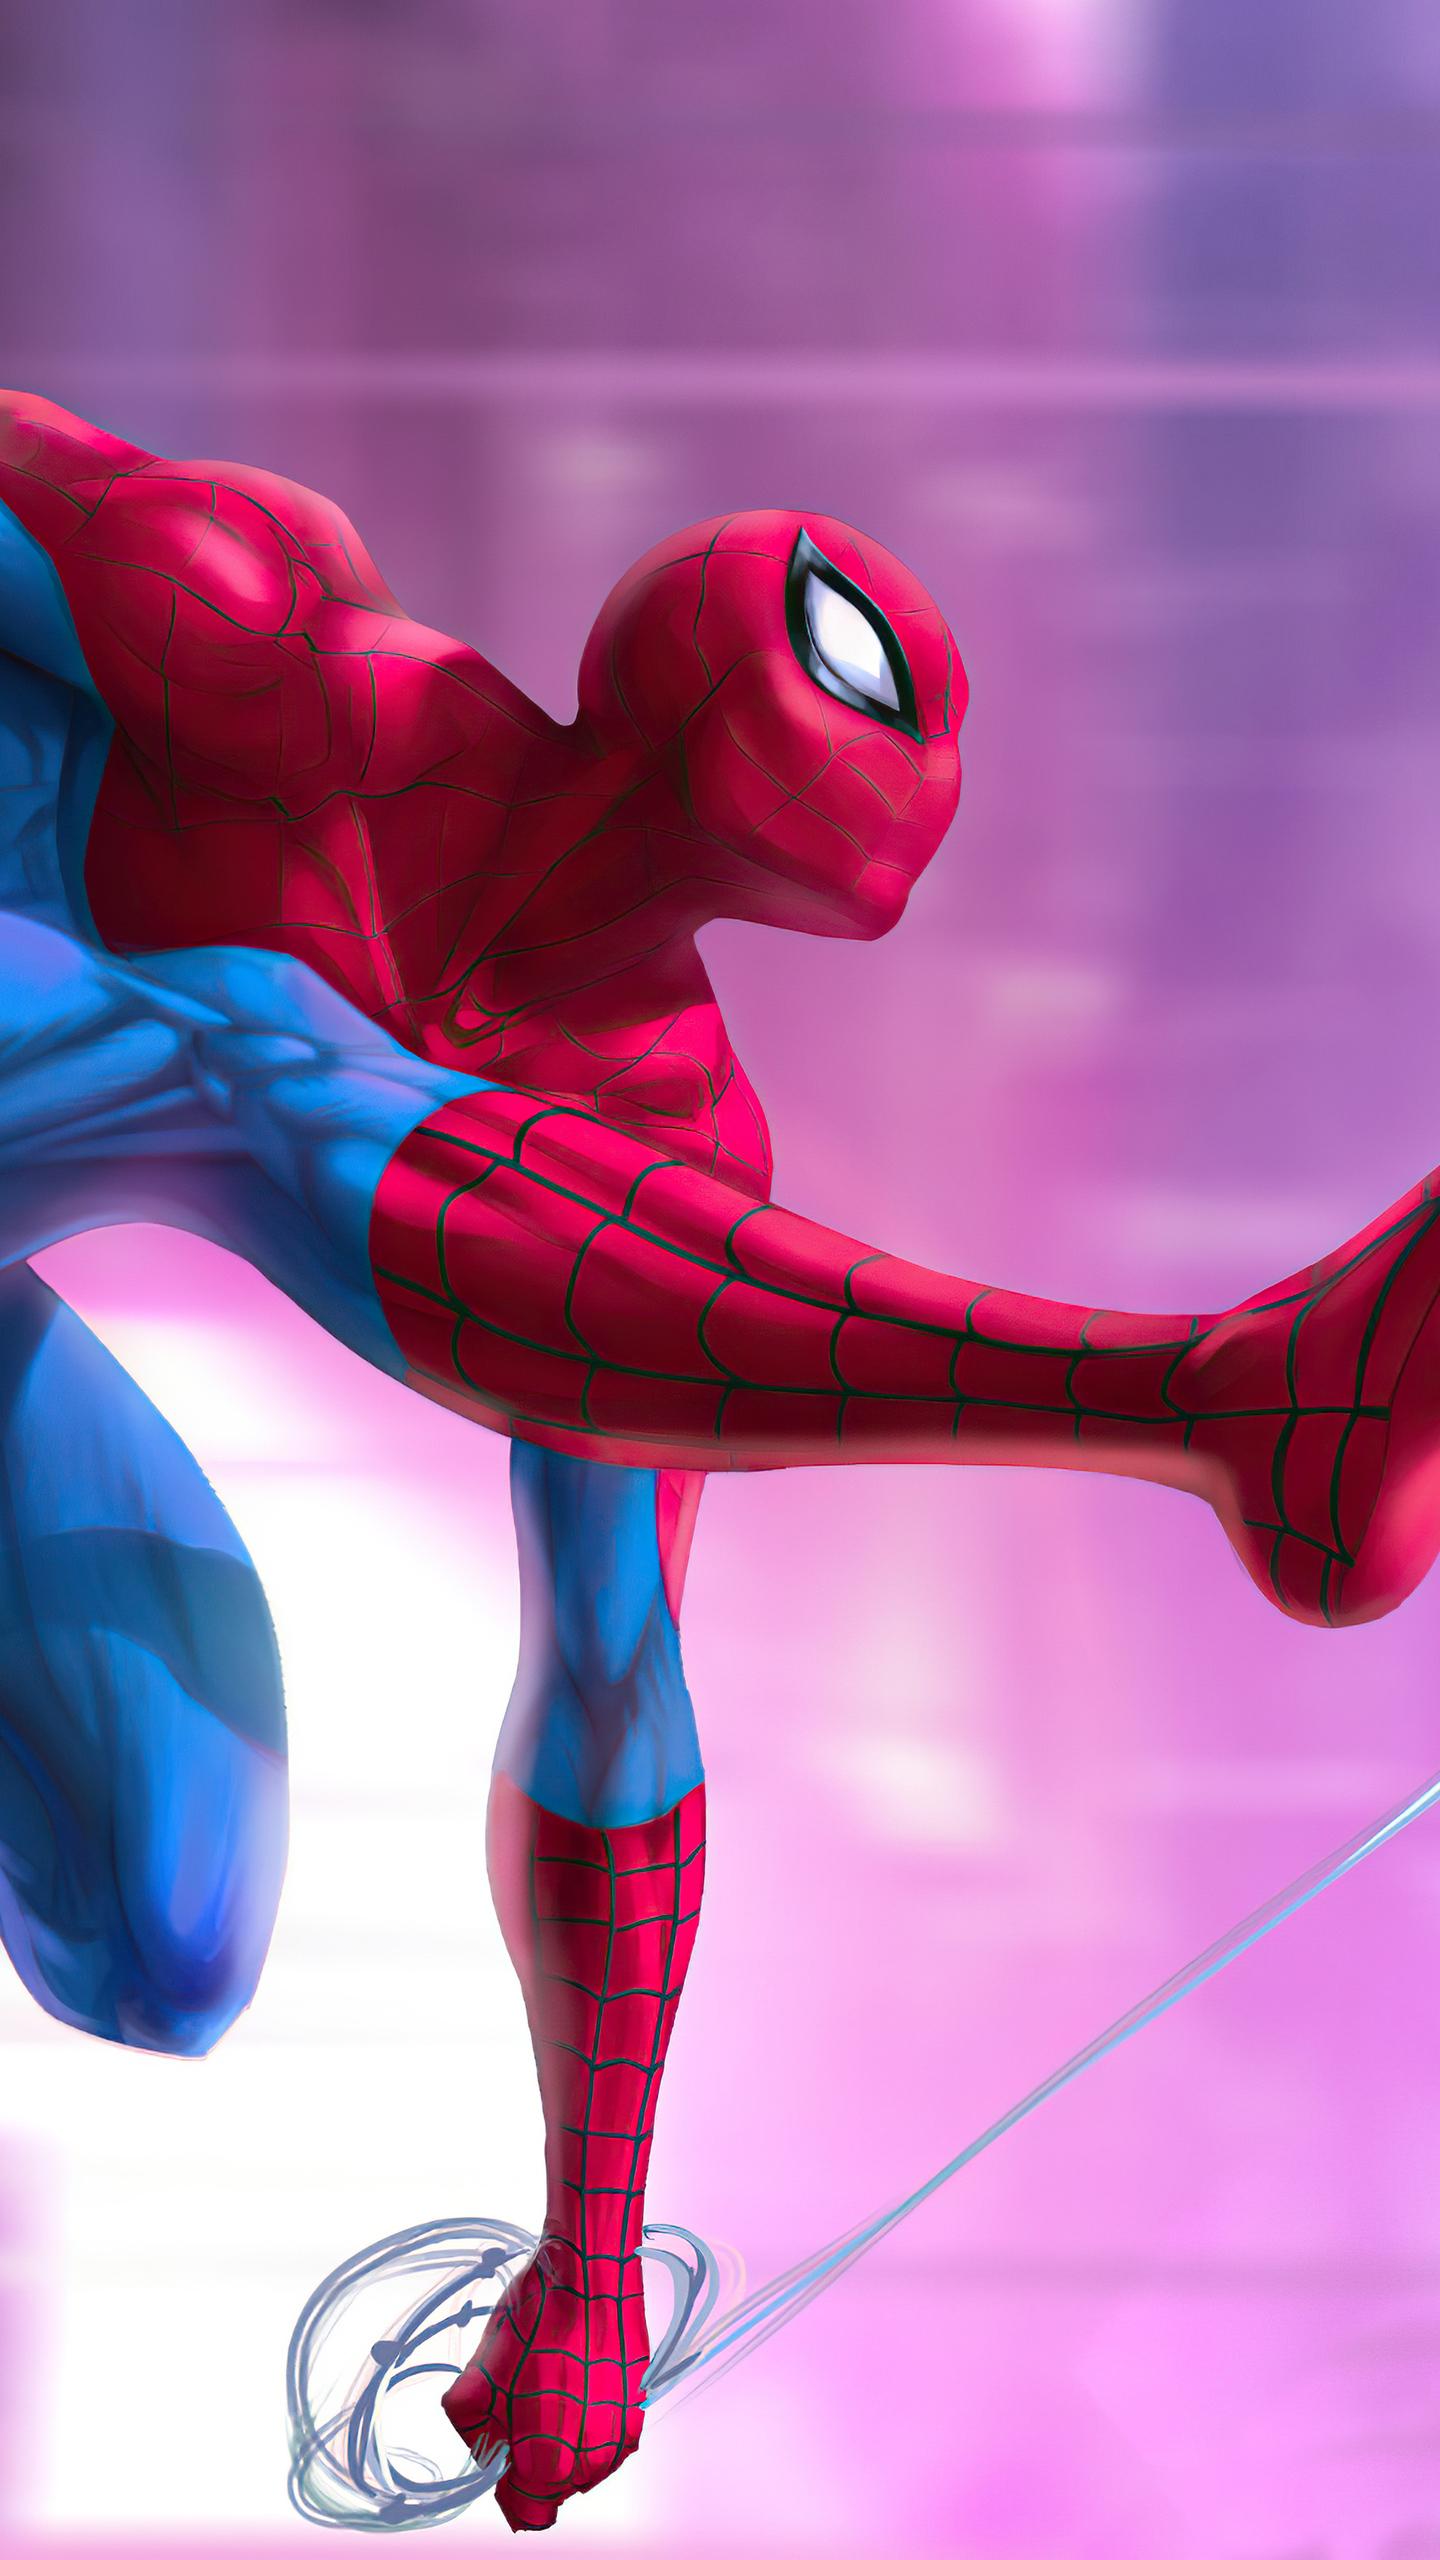 spiderman-digital-illustration-5k-u0.jpg